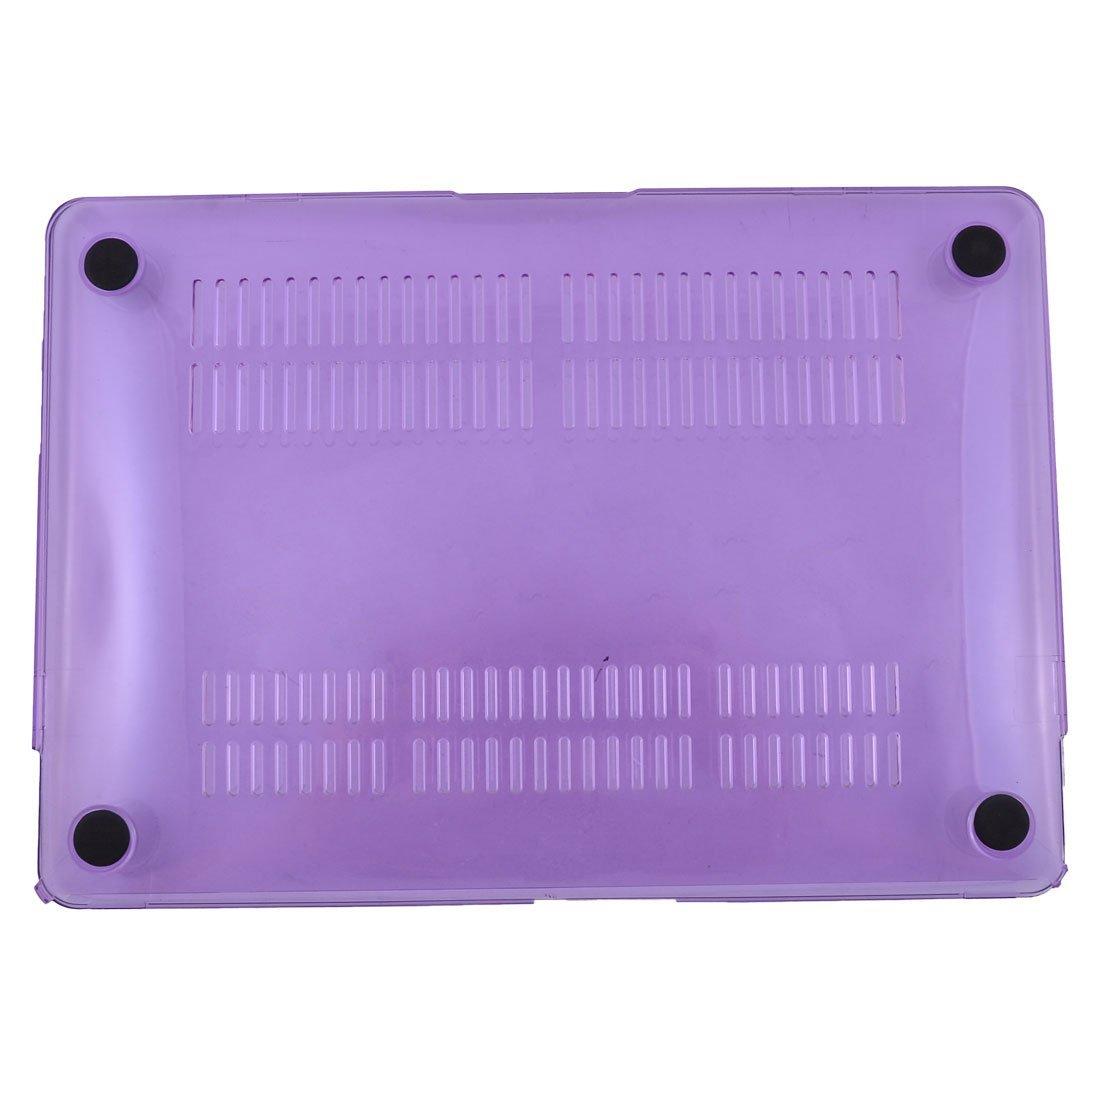 Amazon.com: eDealMax de Cristal de plástico Duro caso cubierta de Shell púrpura Para Apple MacBook 12 pulgadas Retina: Electronics